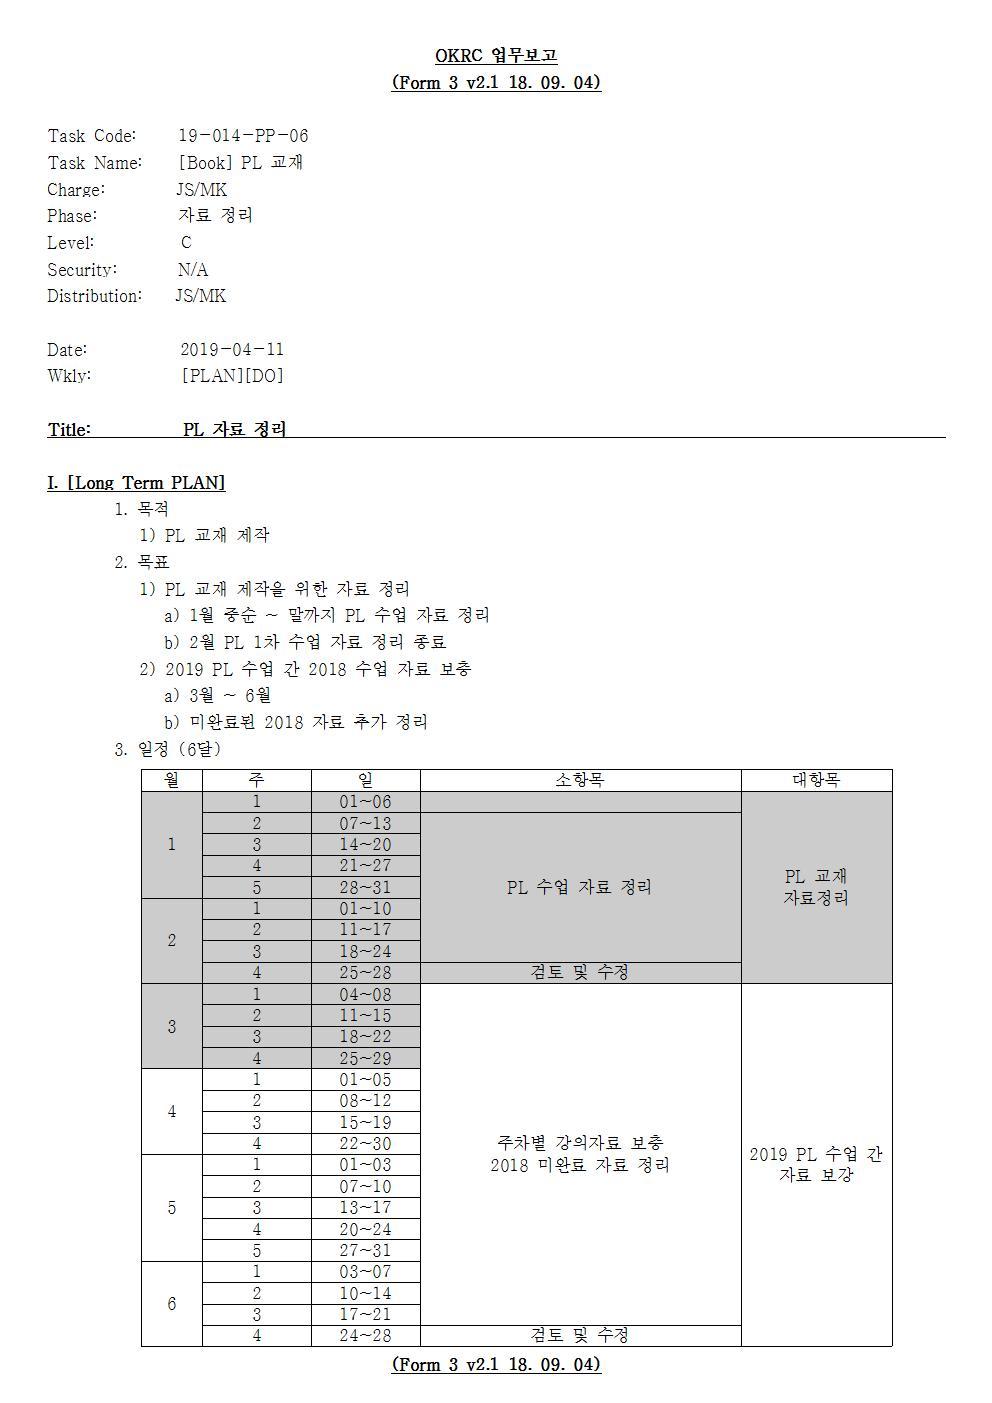 D-[19-014-PP-06]-[Book-PL]-[2019-04-11][JS]001.jpg